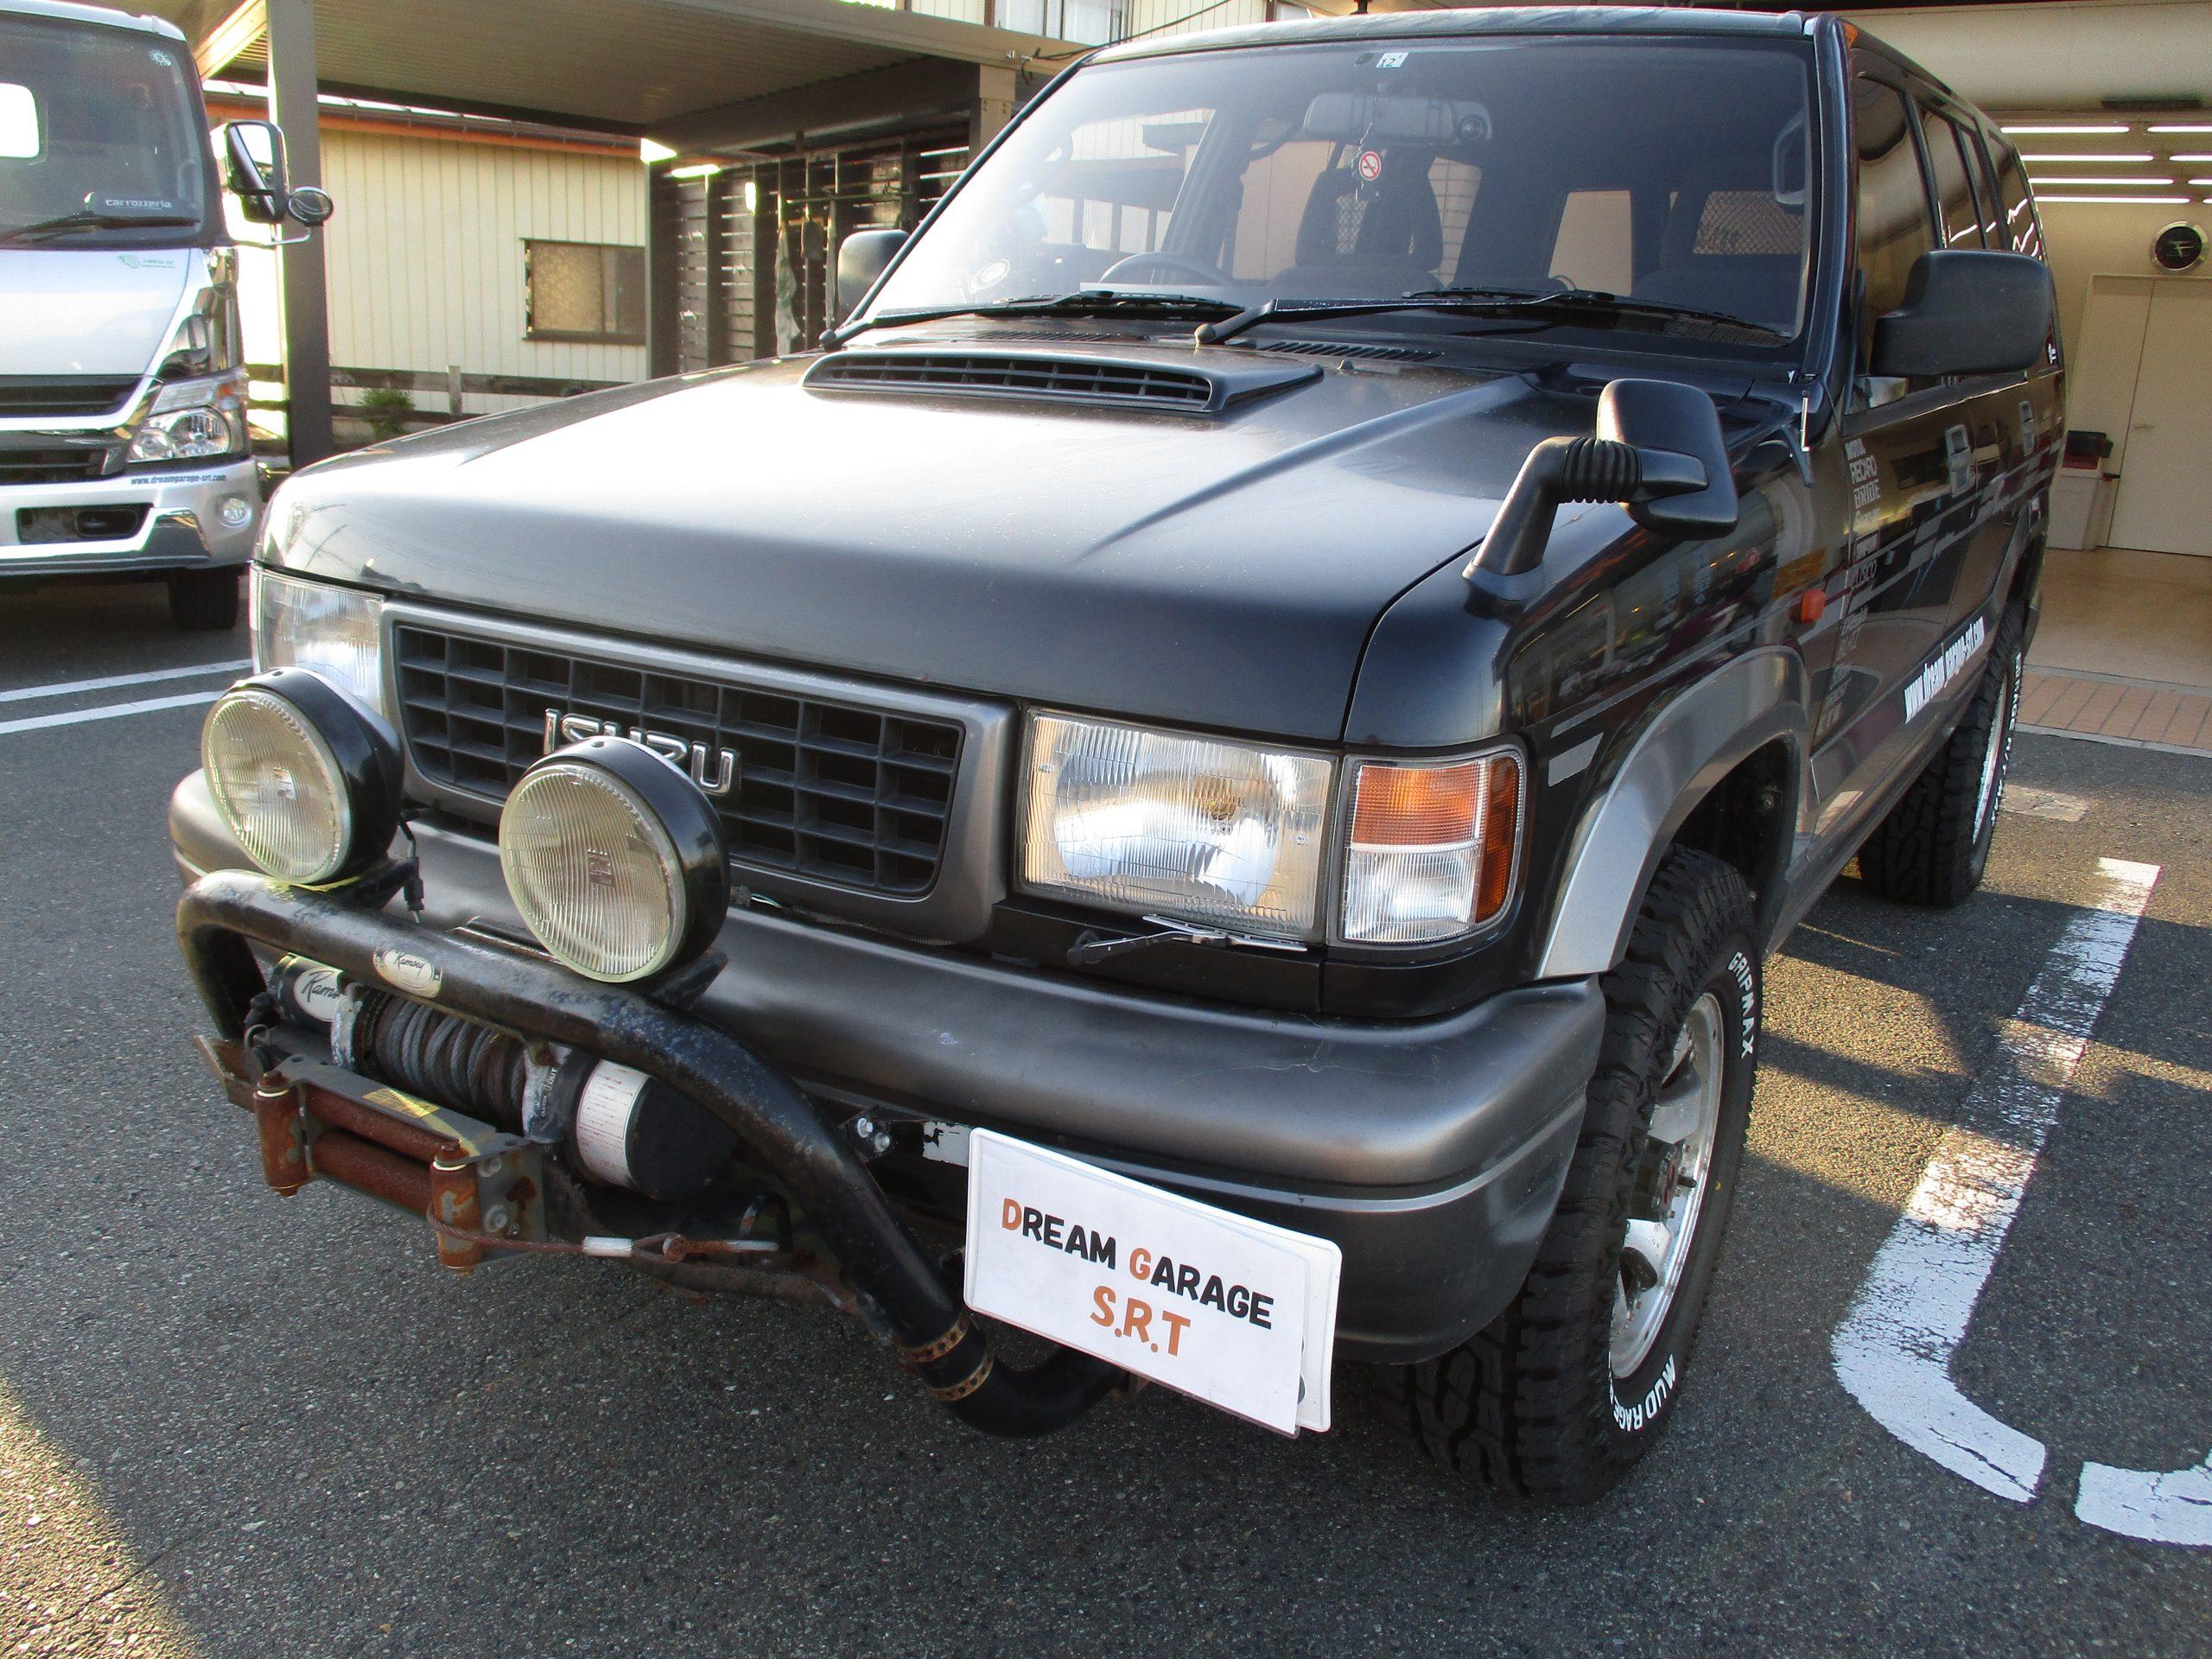 H7 いすゞ ビッグホーン イルムシャーロング 5MT